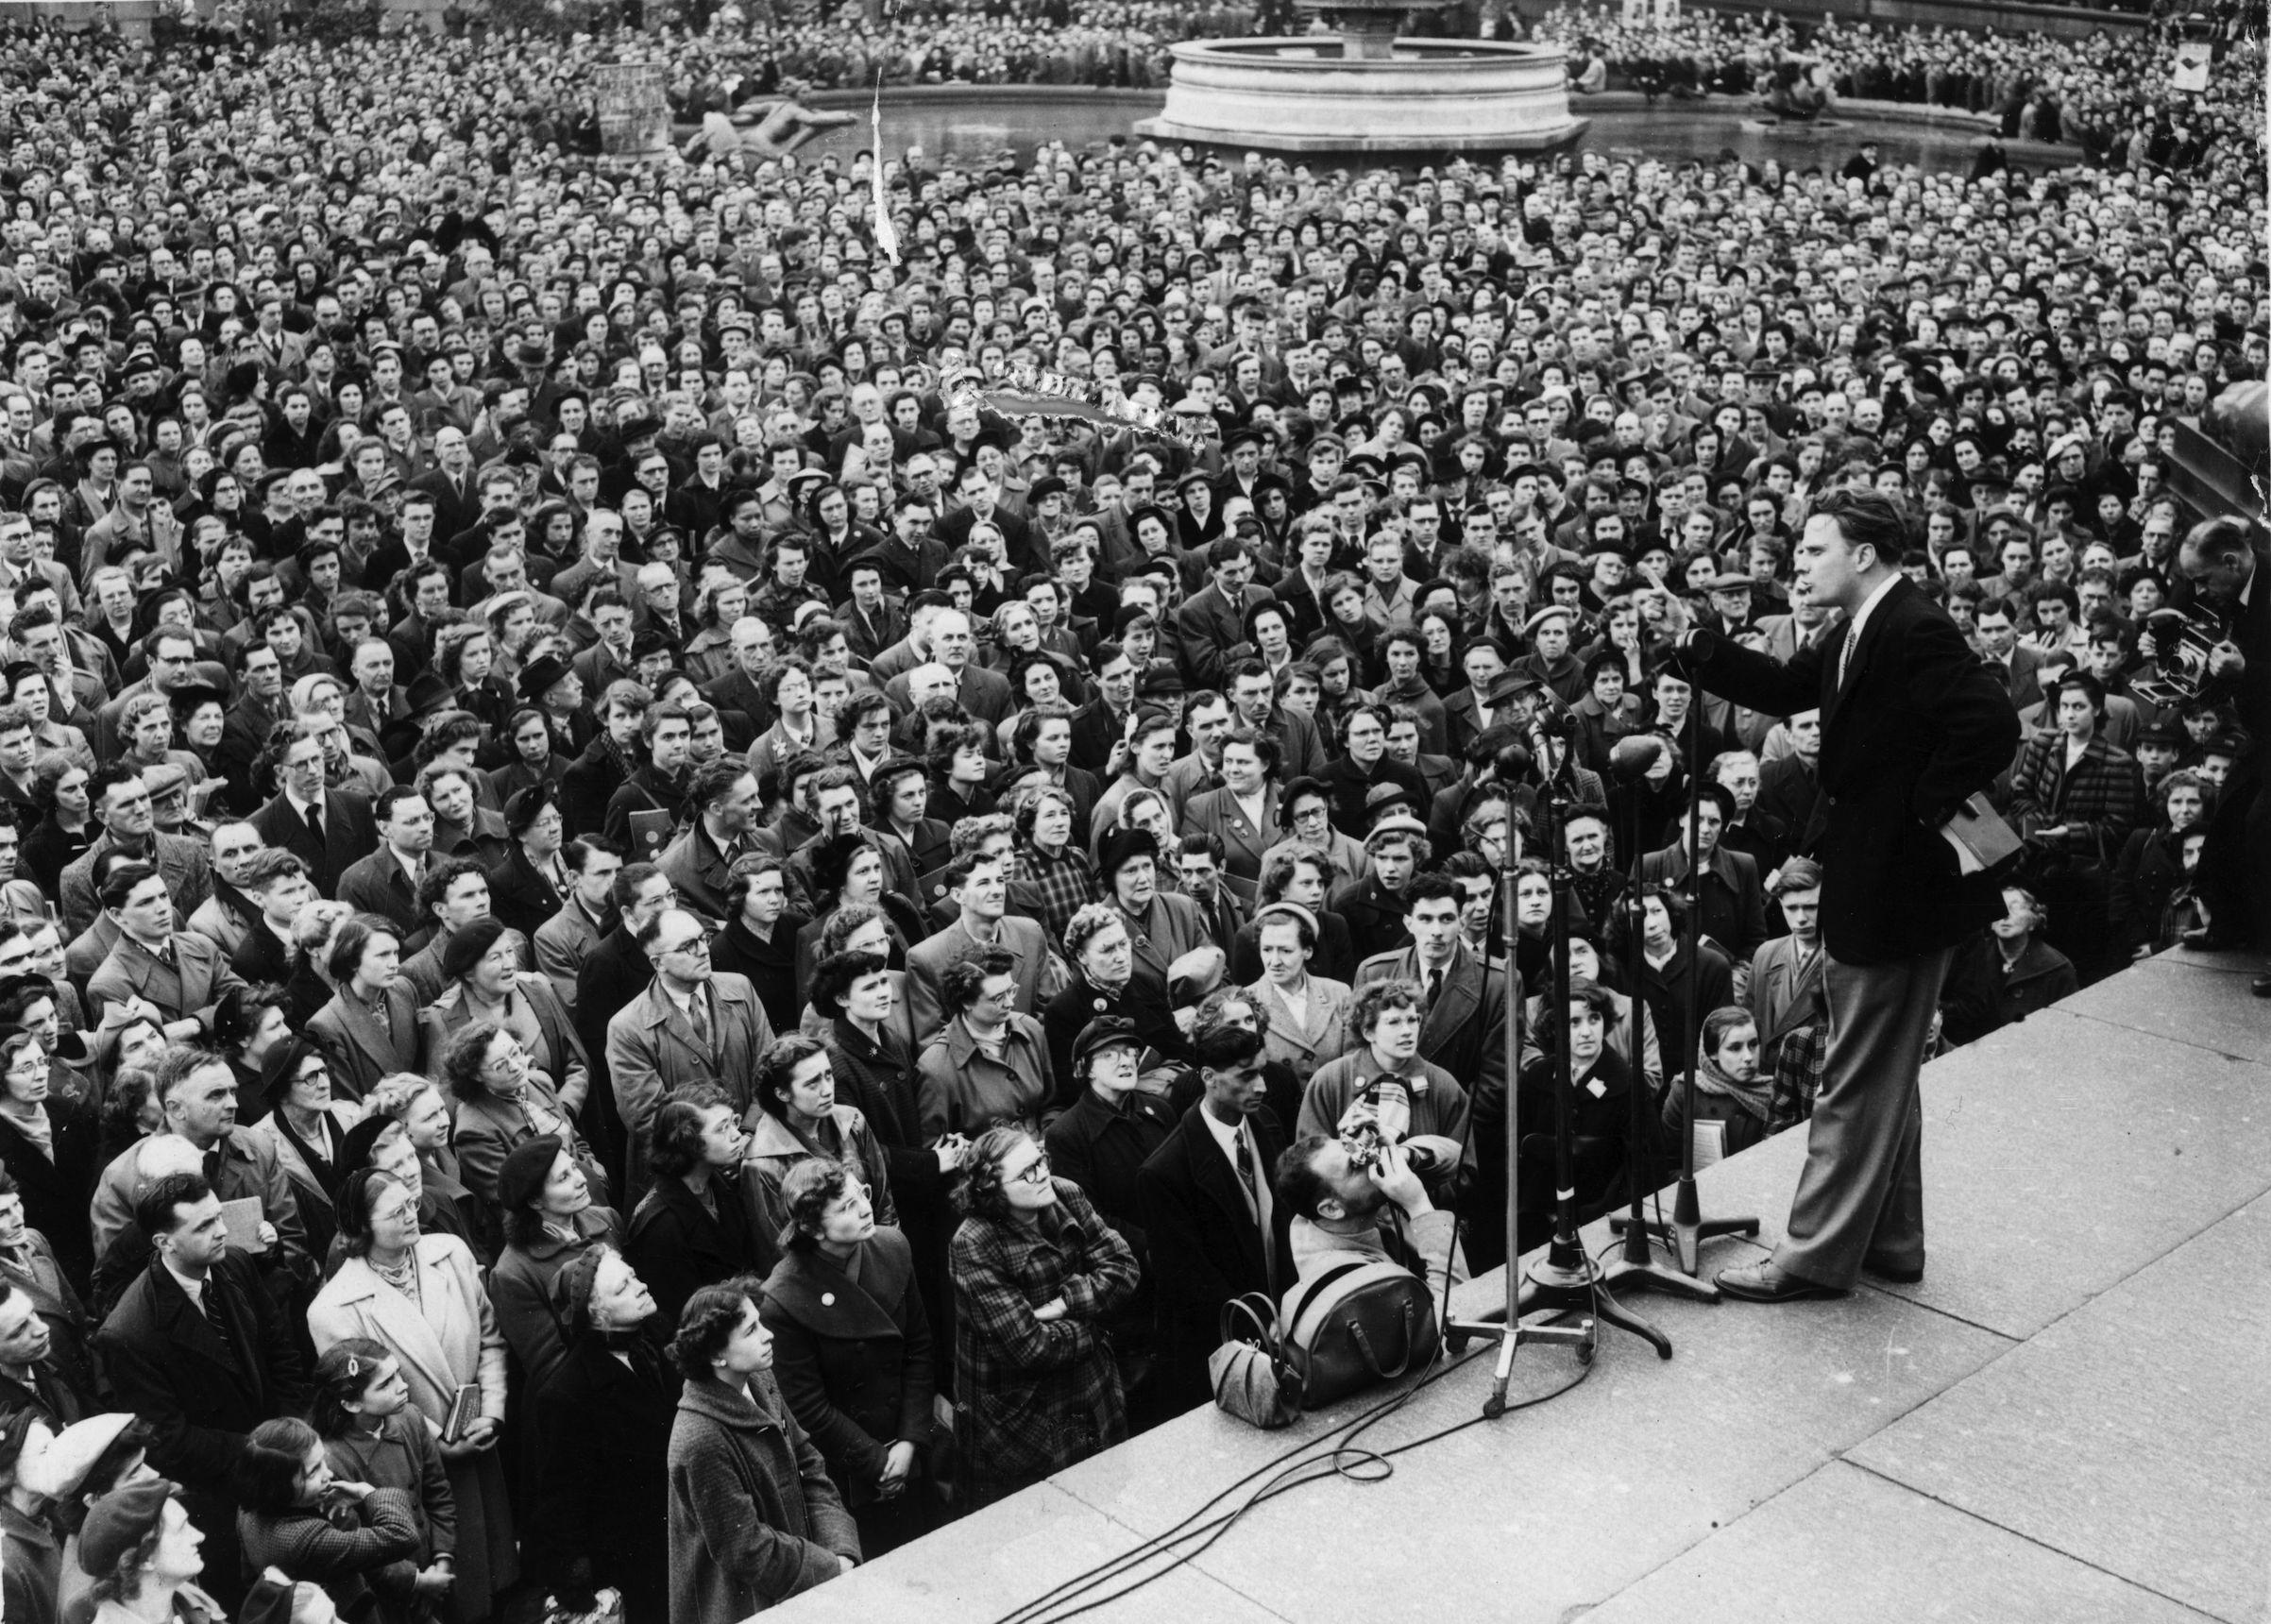 Evangelist Billy Graham addressing the congregation in Trafalgar Square in London in 1954